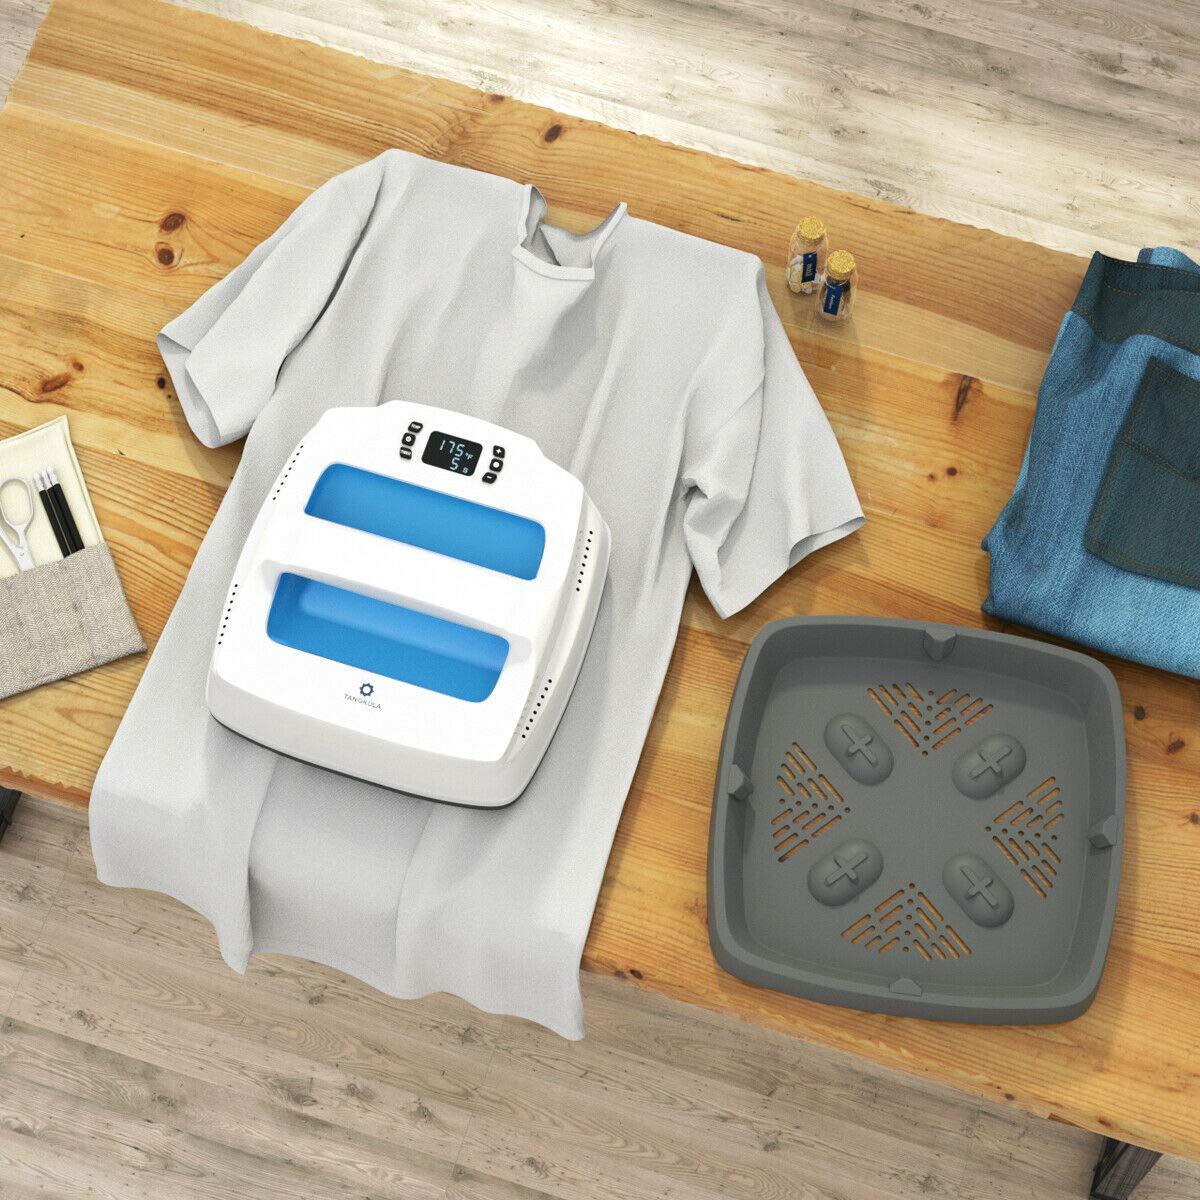 9 x 9 Inches Portable Professional Heat Transfer Home Easy Heat Press T-Shirt Press Printing Machine Blue Tangkula Heat Press Machine Multi-Function Digital Temperature Control Heat Press